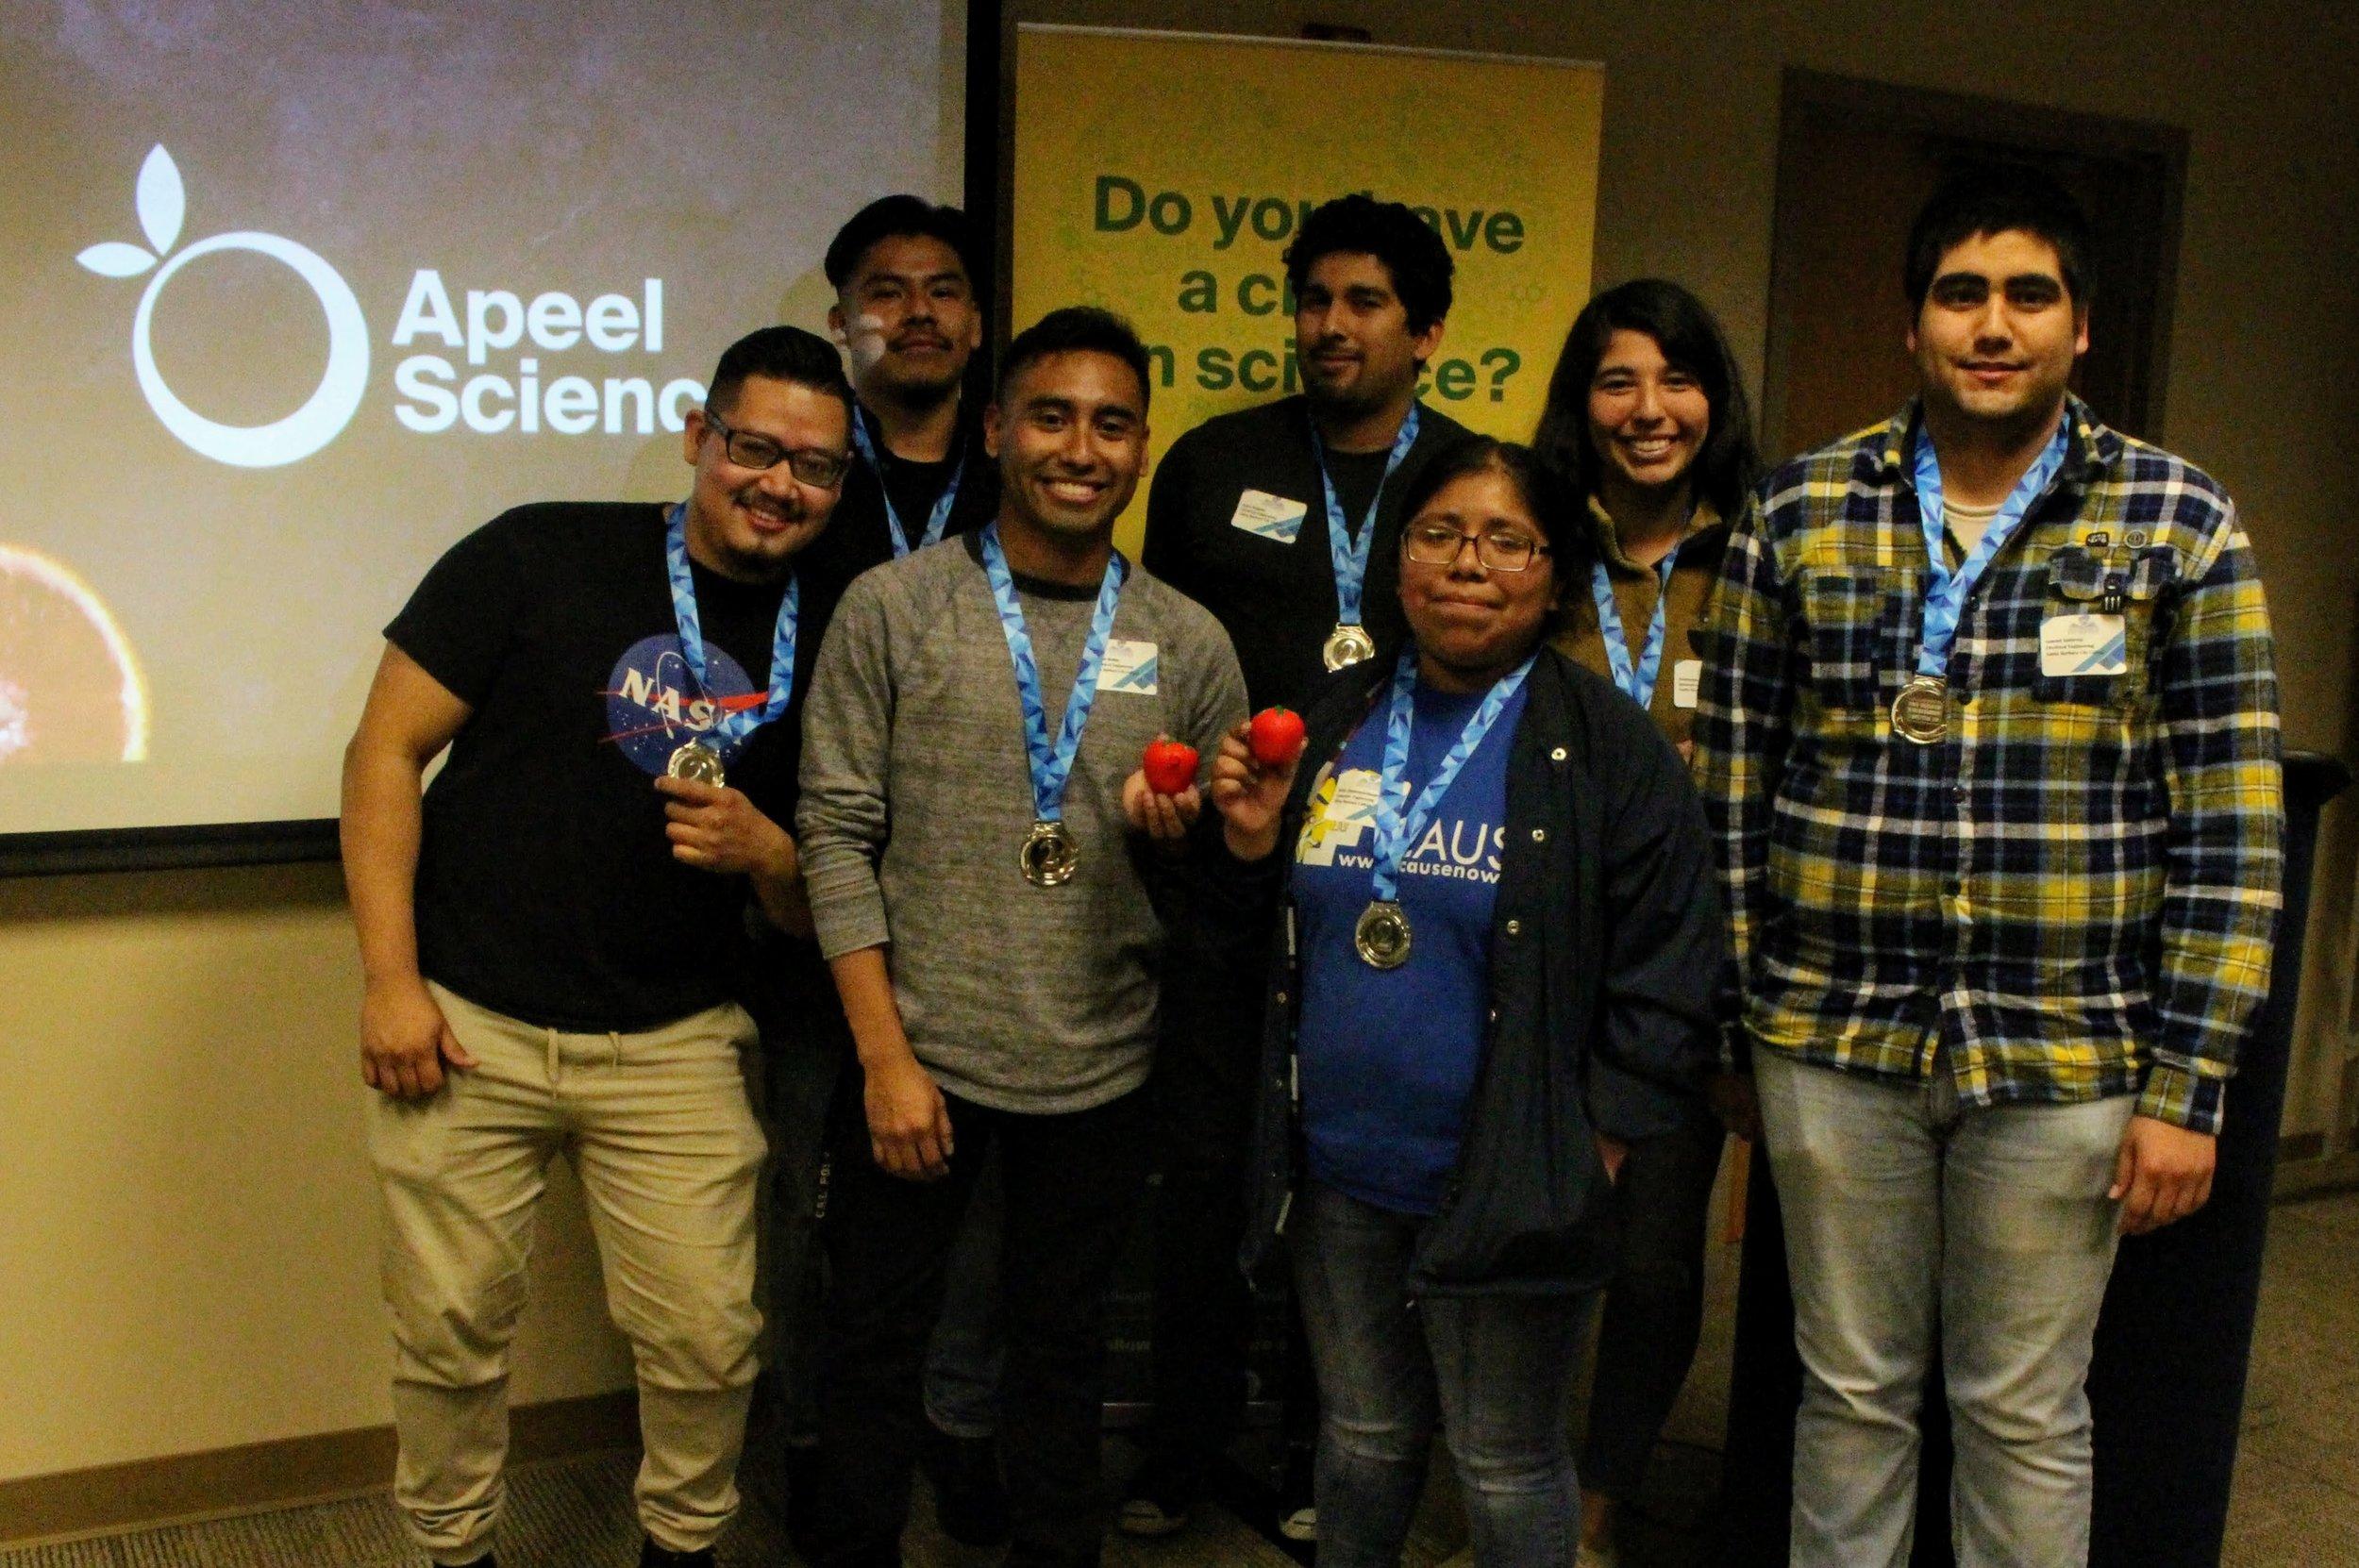 (Left to Right) Christopher [Fernando Estevez - Mentor], Brandon Molina, Daryl Delgado, Sofia Altamirano-Ramirez, Samuel Gutierrez